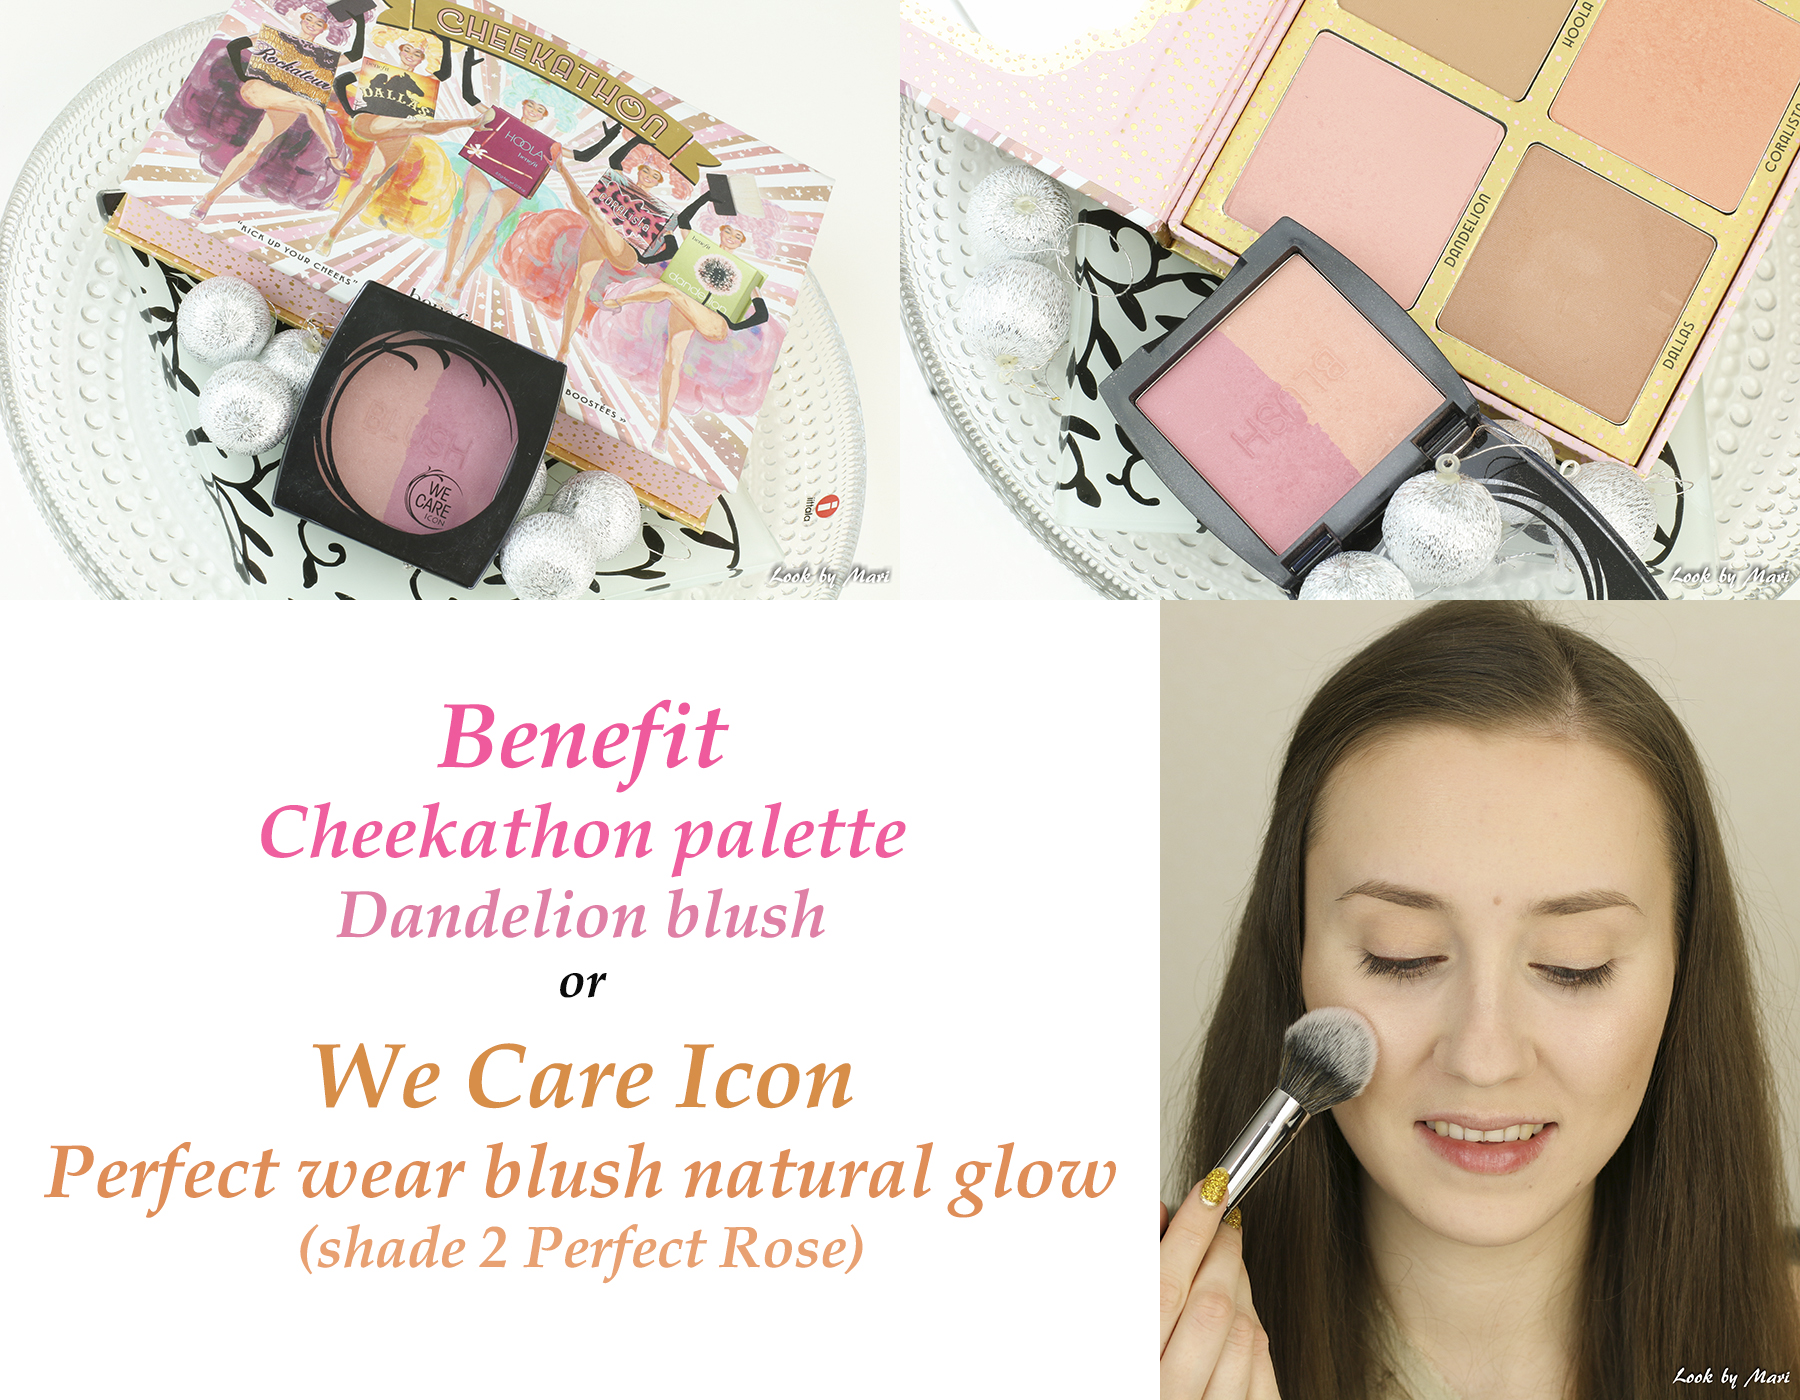 9 blush for every day makeup look poskipuna arkimeikkiin we care icon dandelion blush